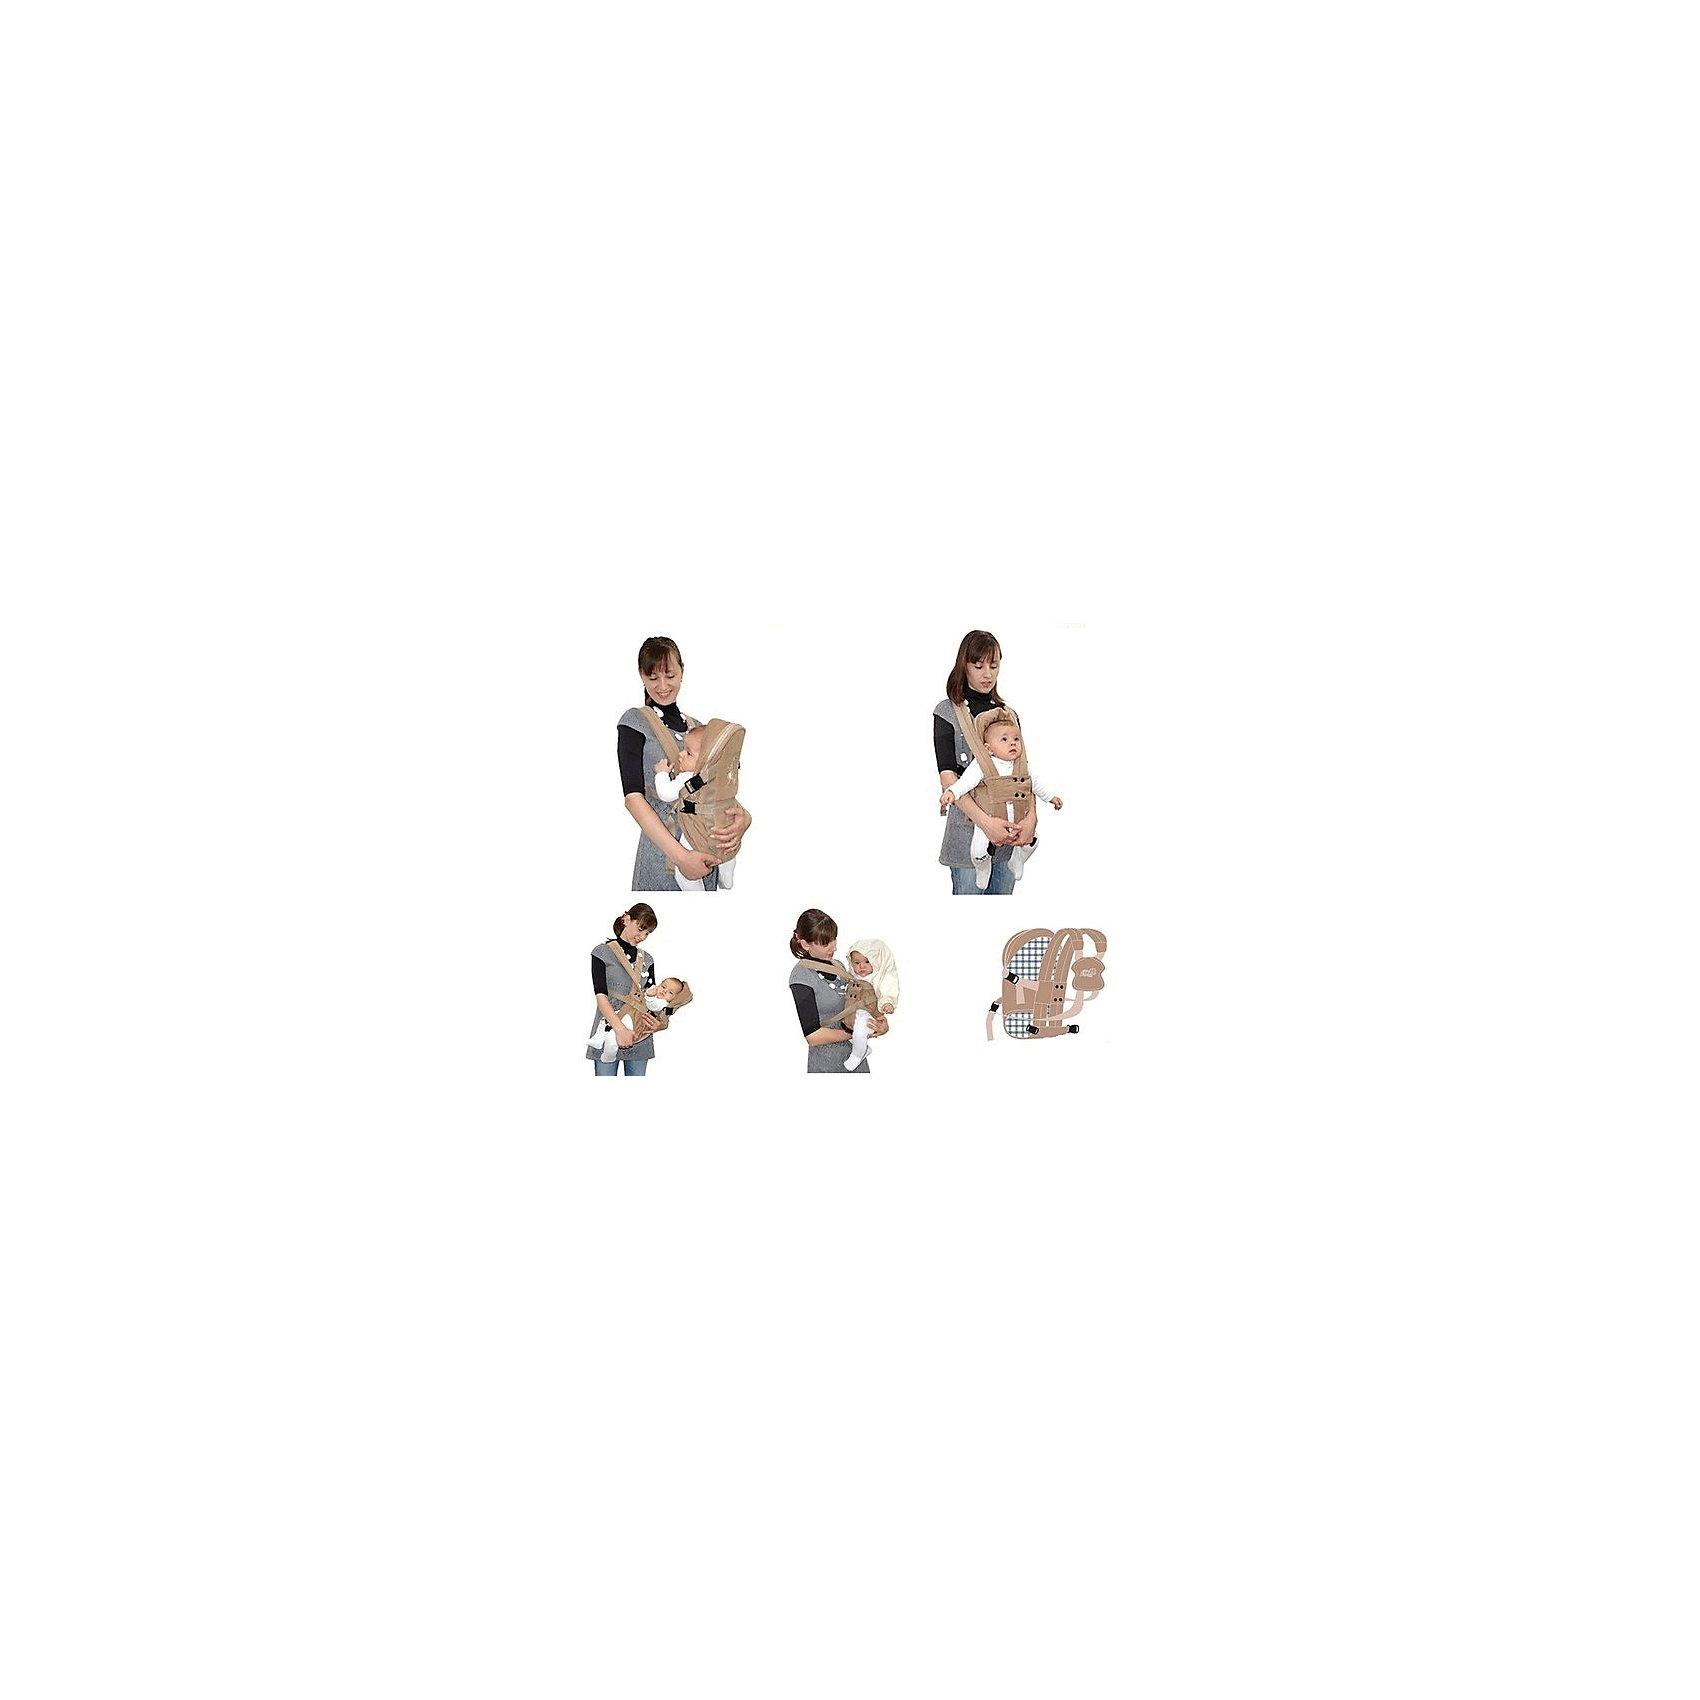 Кенгуру-рюкзак KENGO, Little People